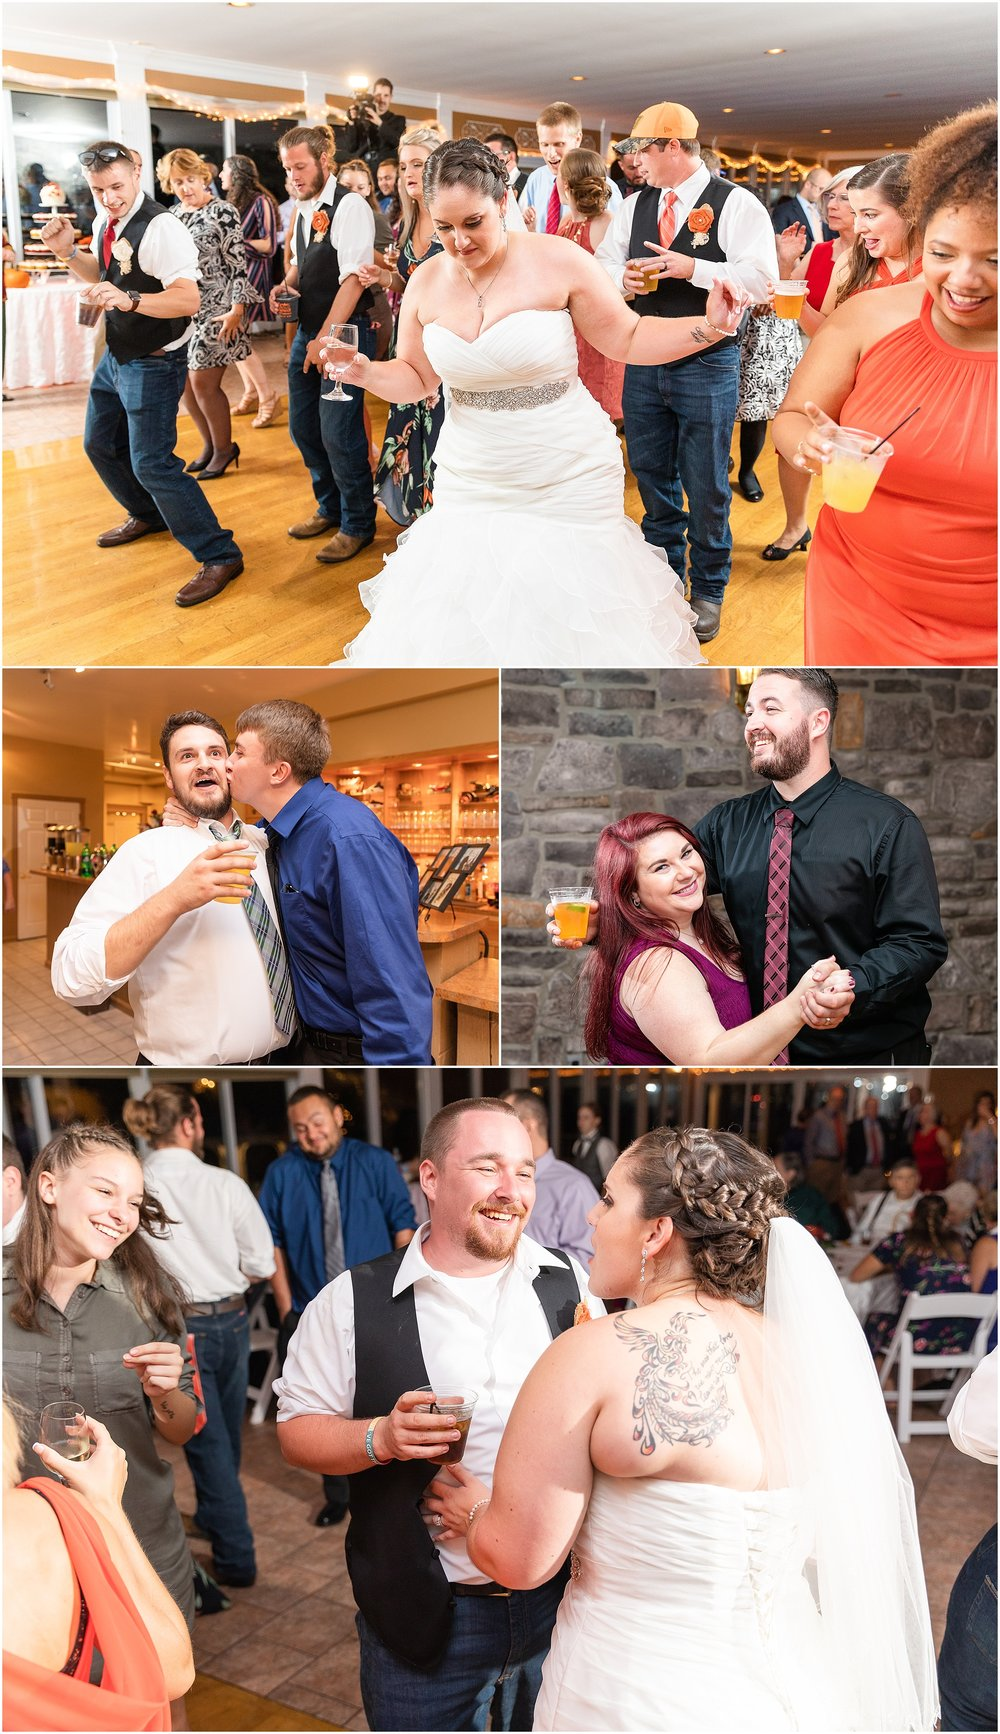 Morningside-inn-wedding-photos_0233.jpg